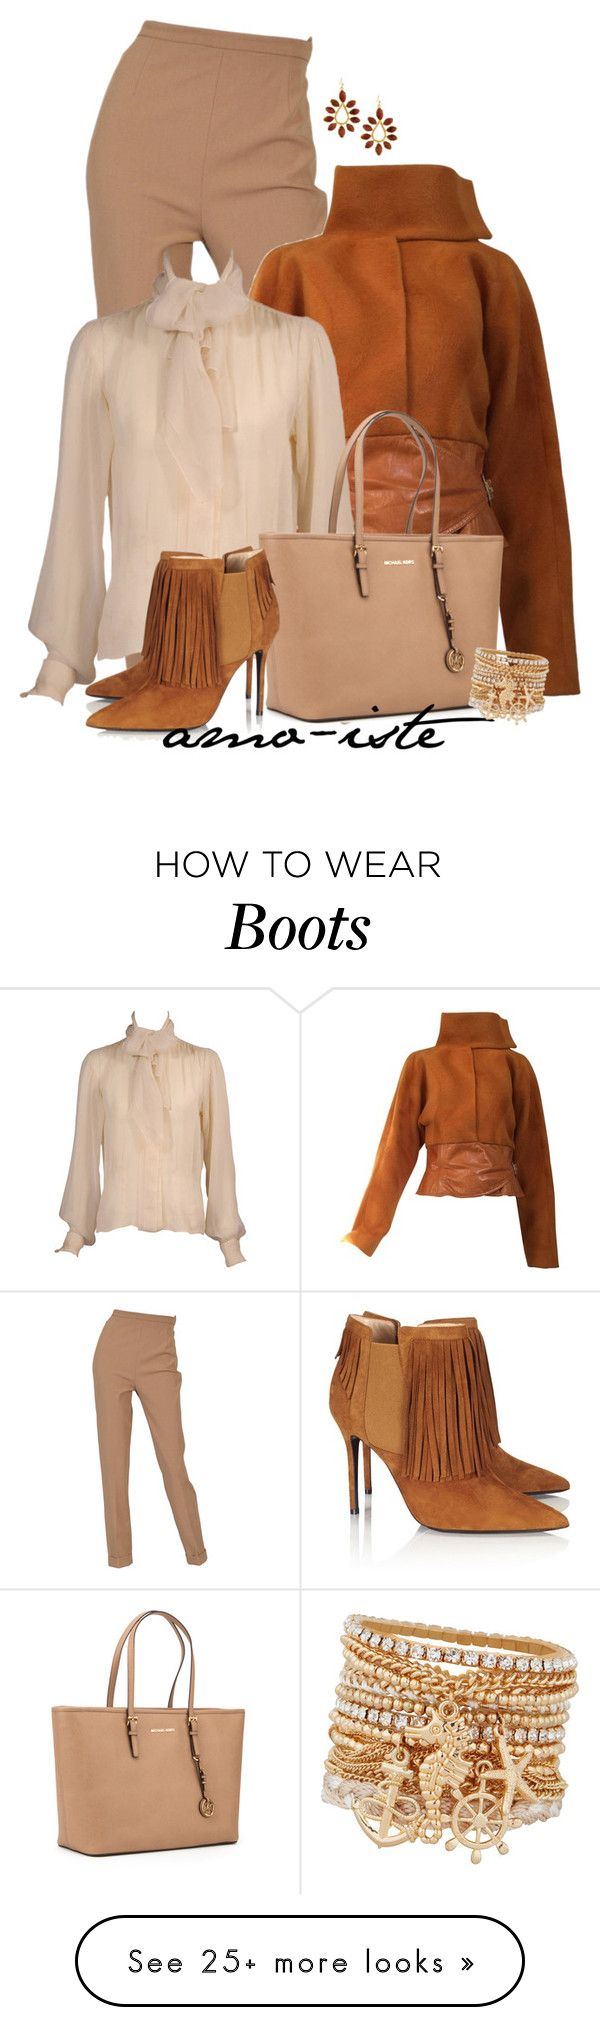 """Fringed Boots"" by amo-iste on Polyvore featuring Hermès, Yves Saint Laurent, MICHAEL Michael Kors, Aperlaï, Kendra Scott and ALDO"